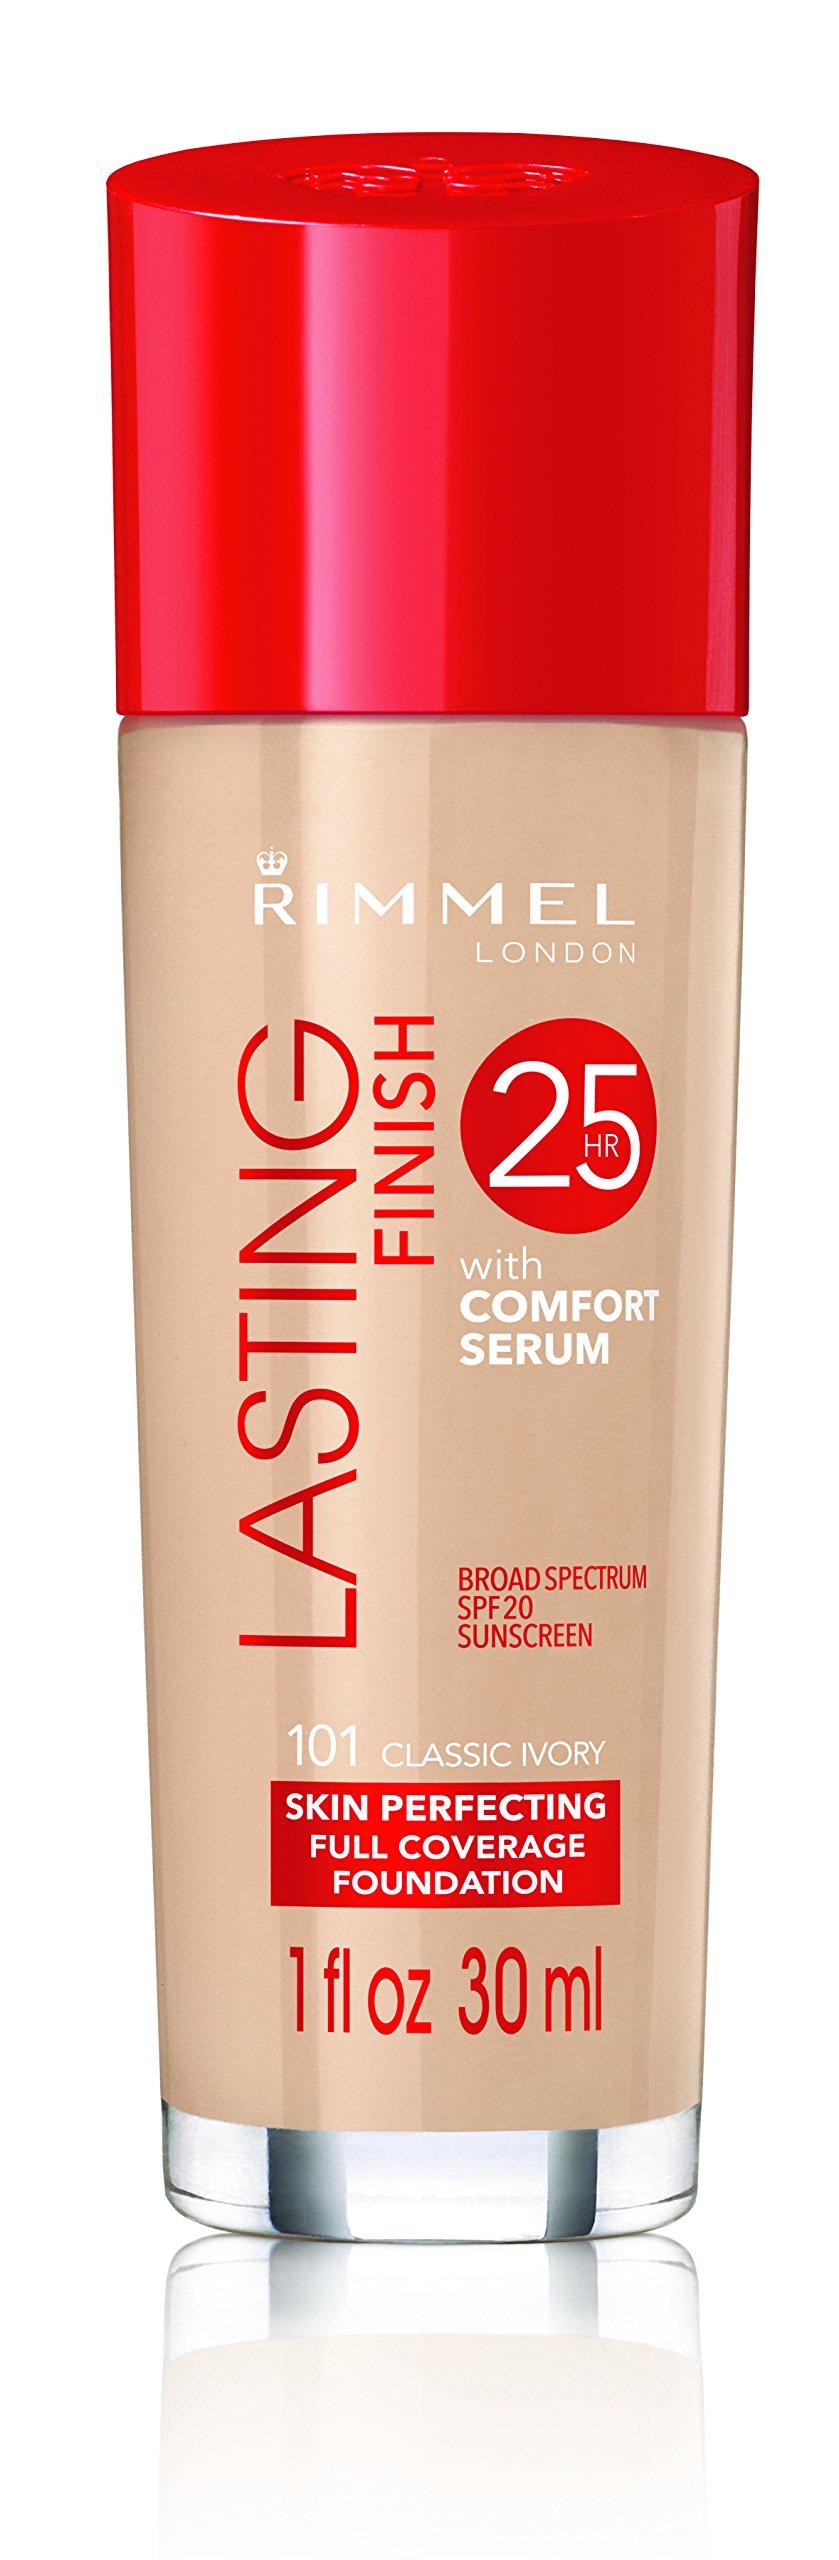 Rimmel Lasting Finish Foundation, Classic Ivory, 1 oz., Medium Coverage Liquid Foundation with SPF 20, Long Lasting Smooth & Even Look